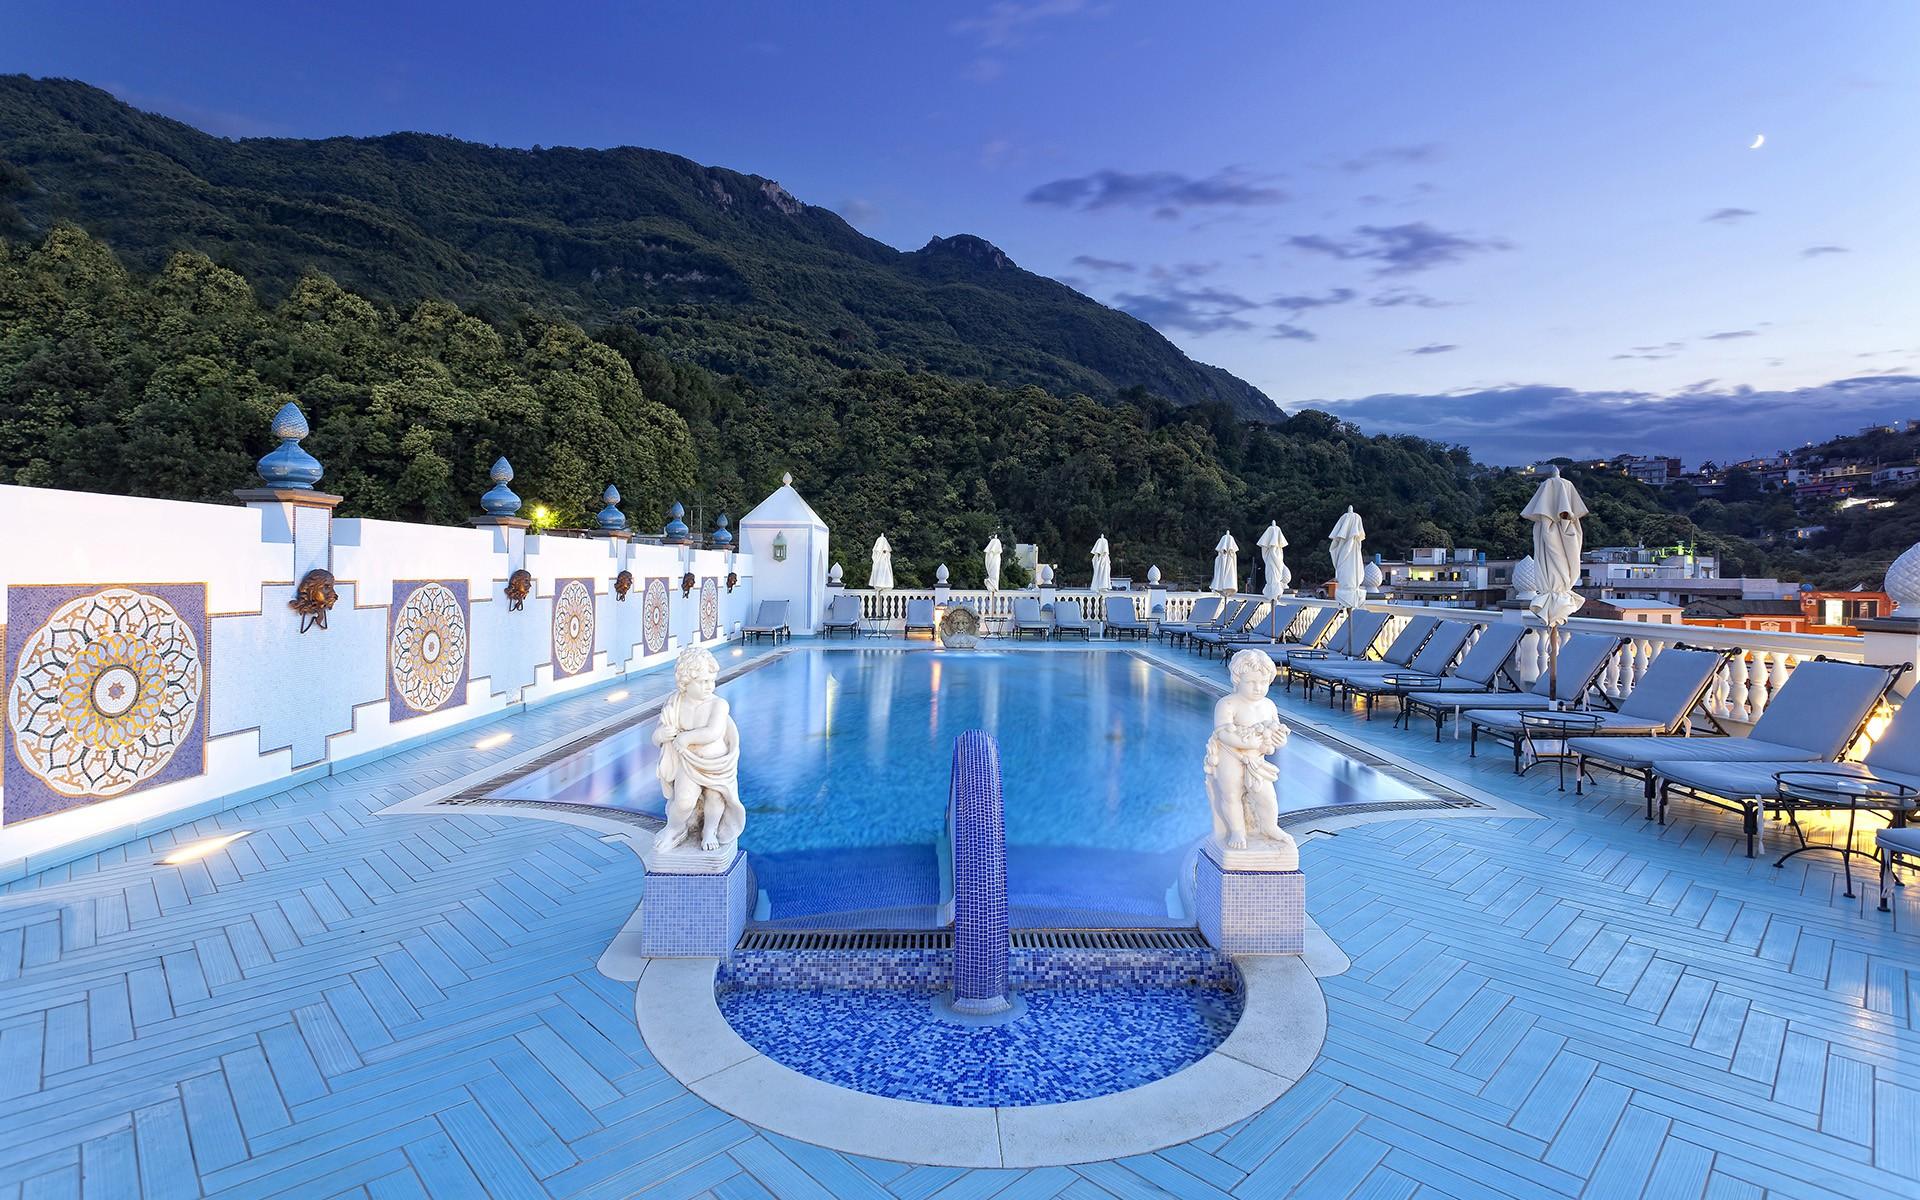 Bagno Giapponese Terme Ischia : Piscine poseidon ischia foto di giardini poseidon terme forio